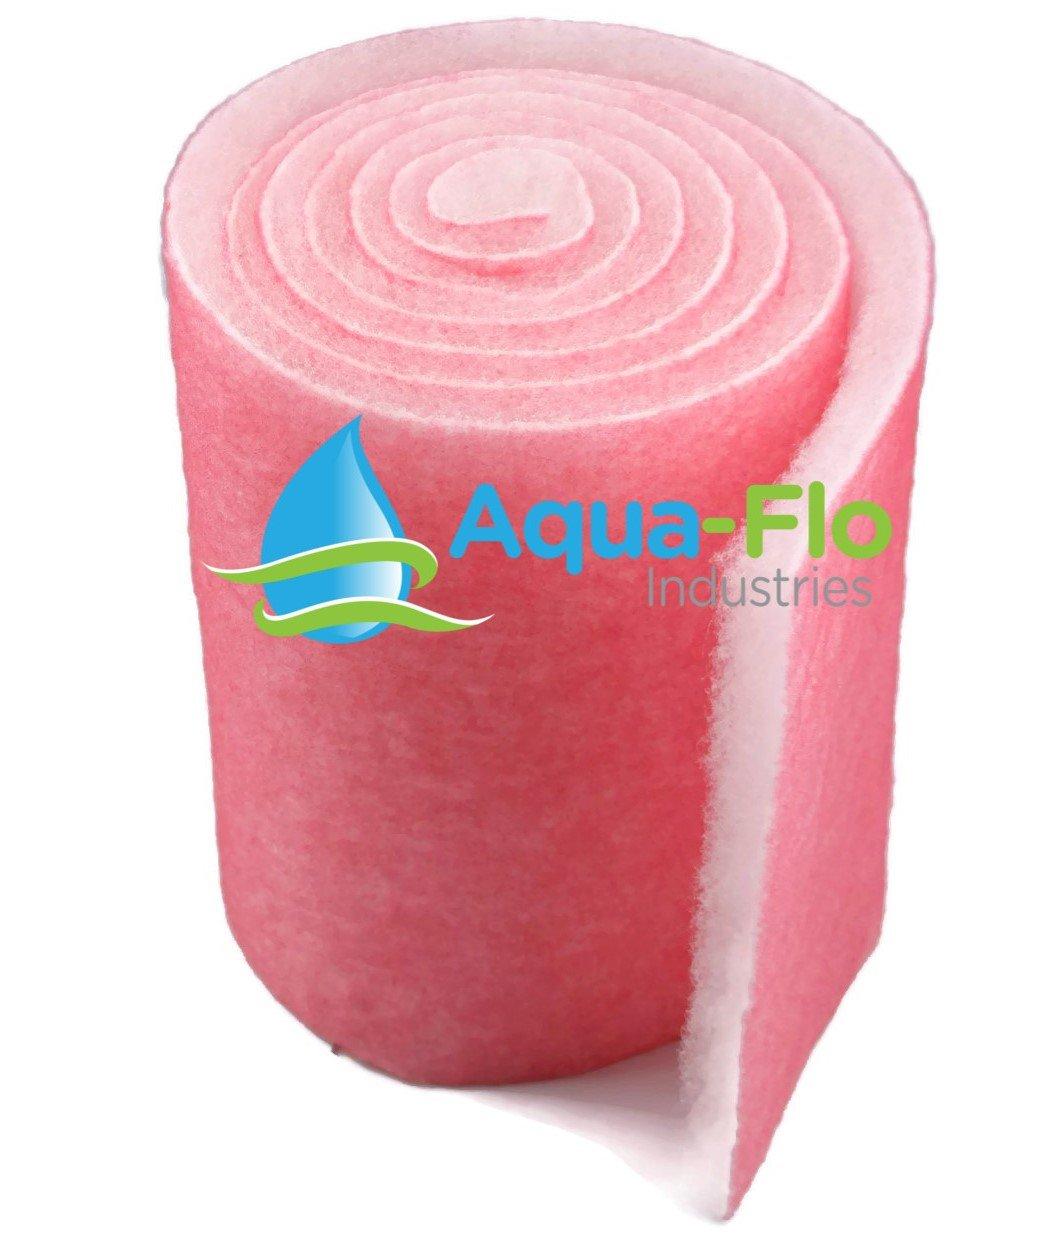 Aqua-Flo 18'' Pond & Aquarium Filter Media, 120'' (10 Feet) Long x 1'' Thick (Pink/White)